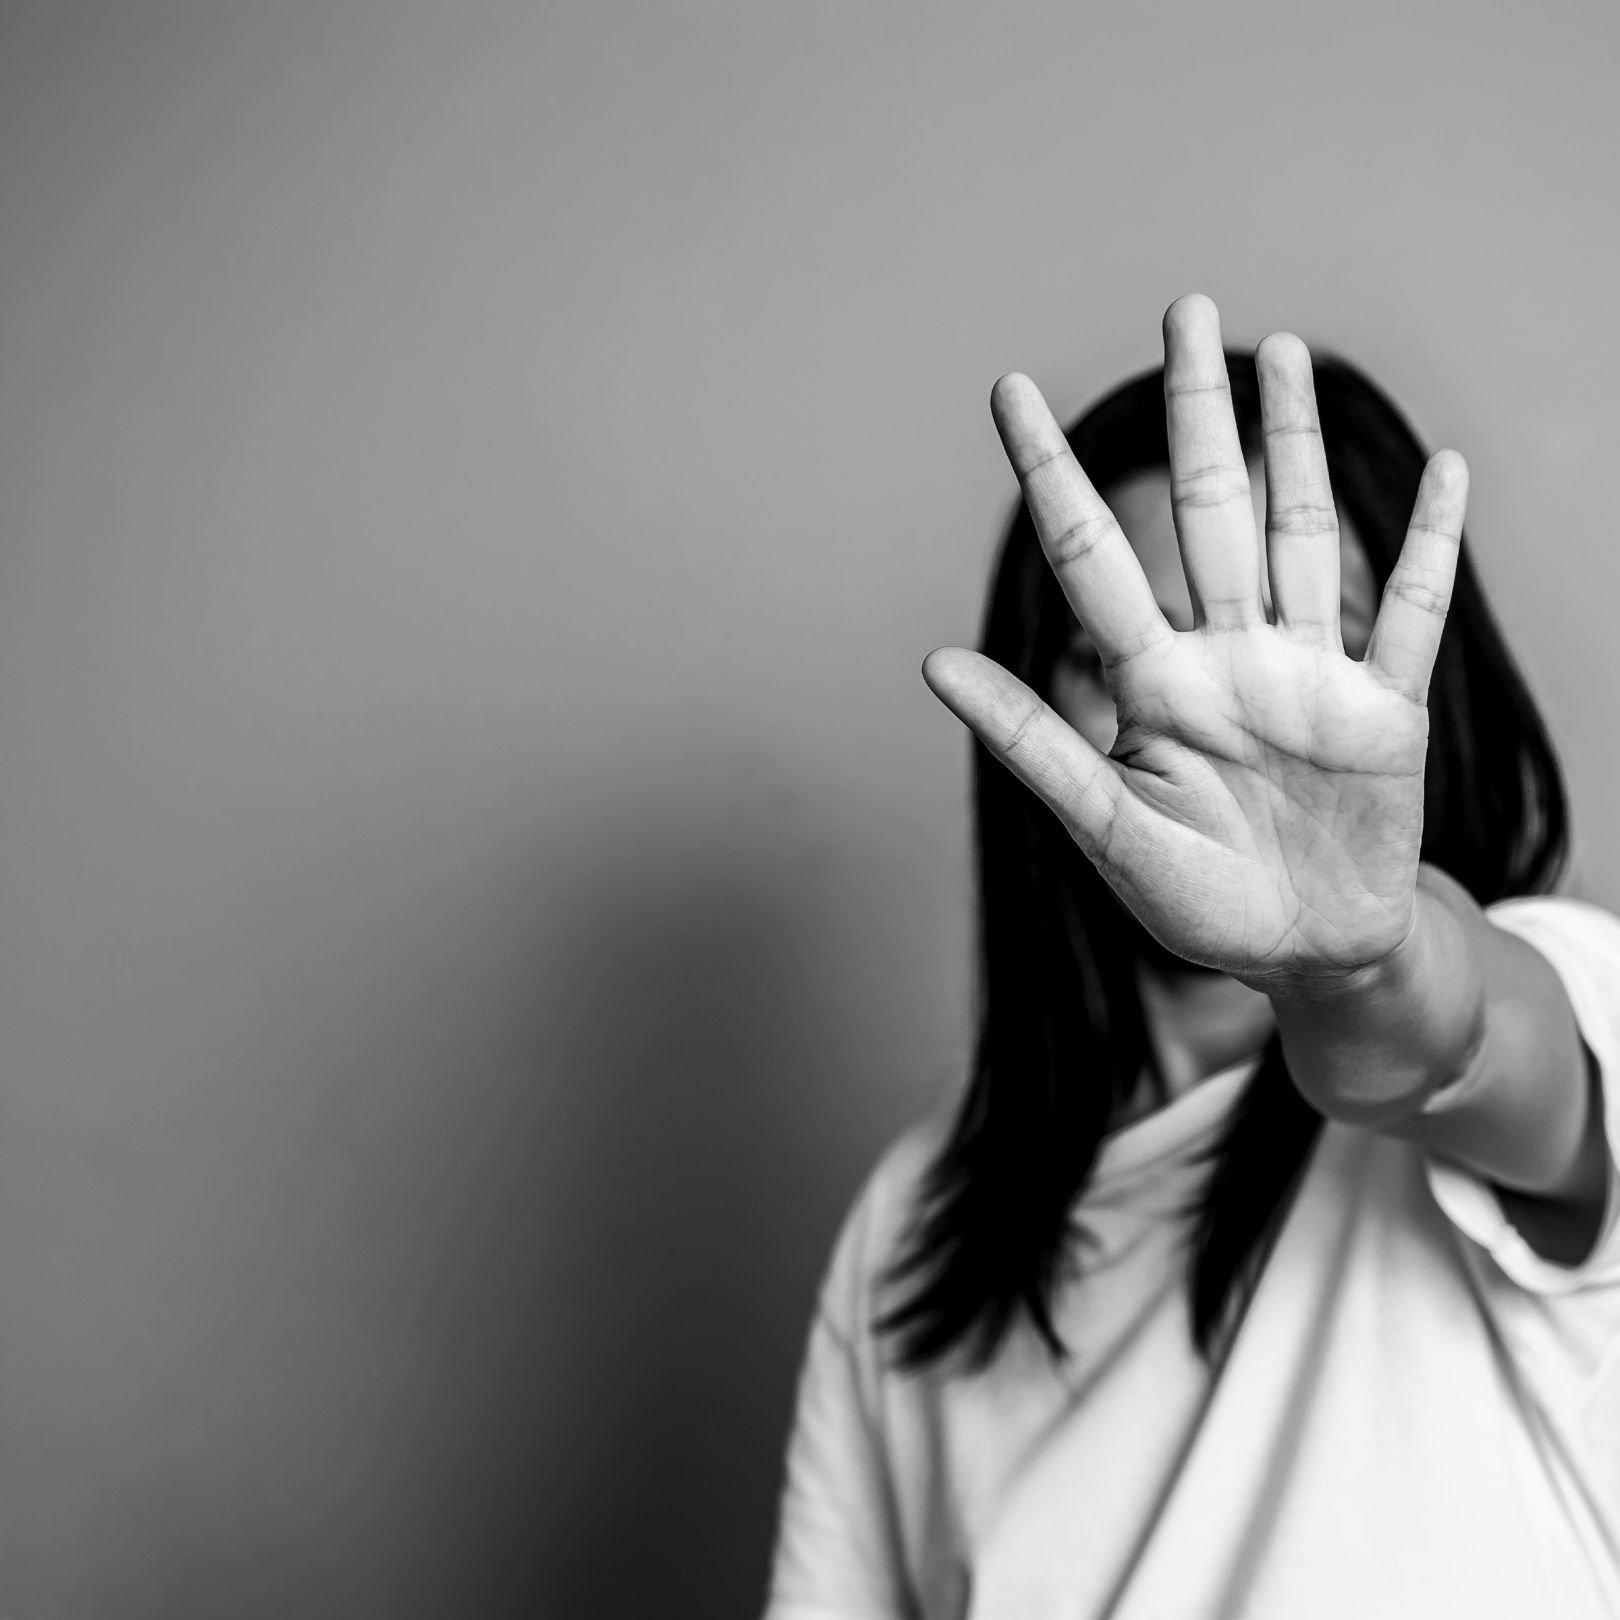 Swindon domestic abuse support service